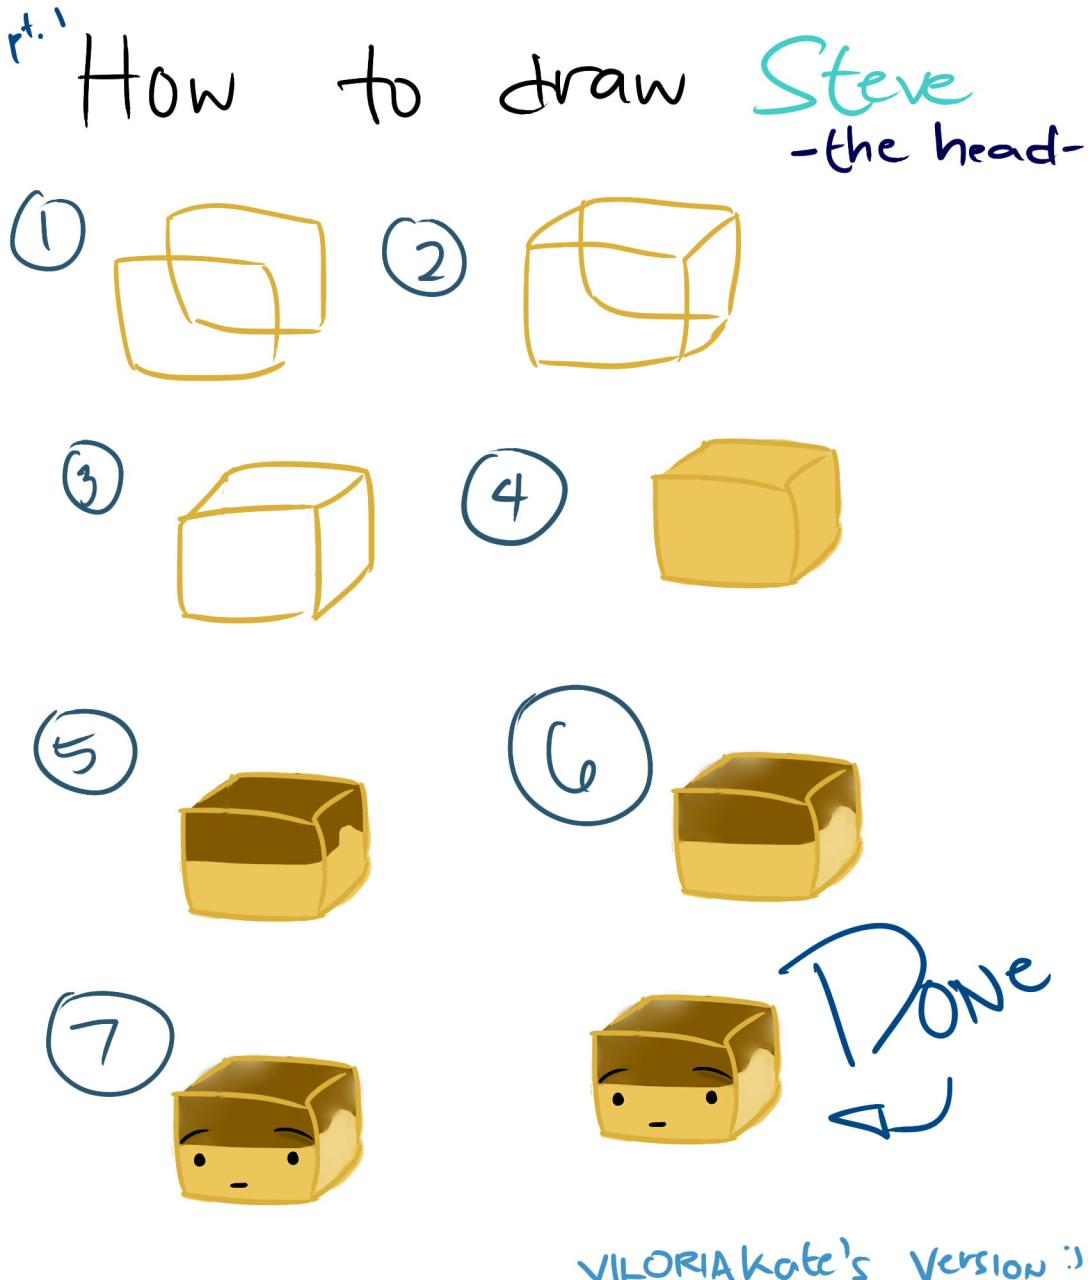 how to draw steve pt 1 minecraft blog